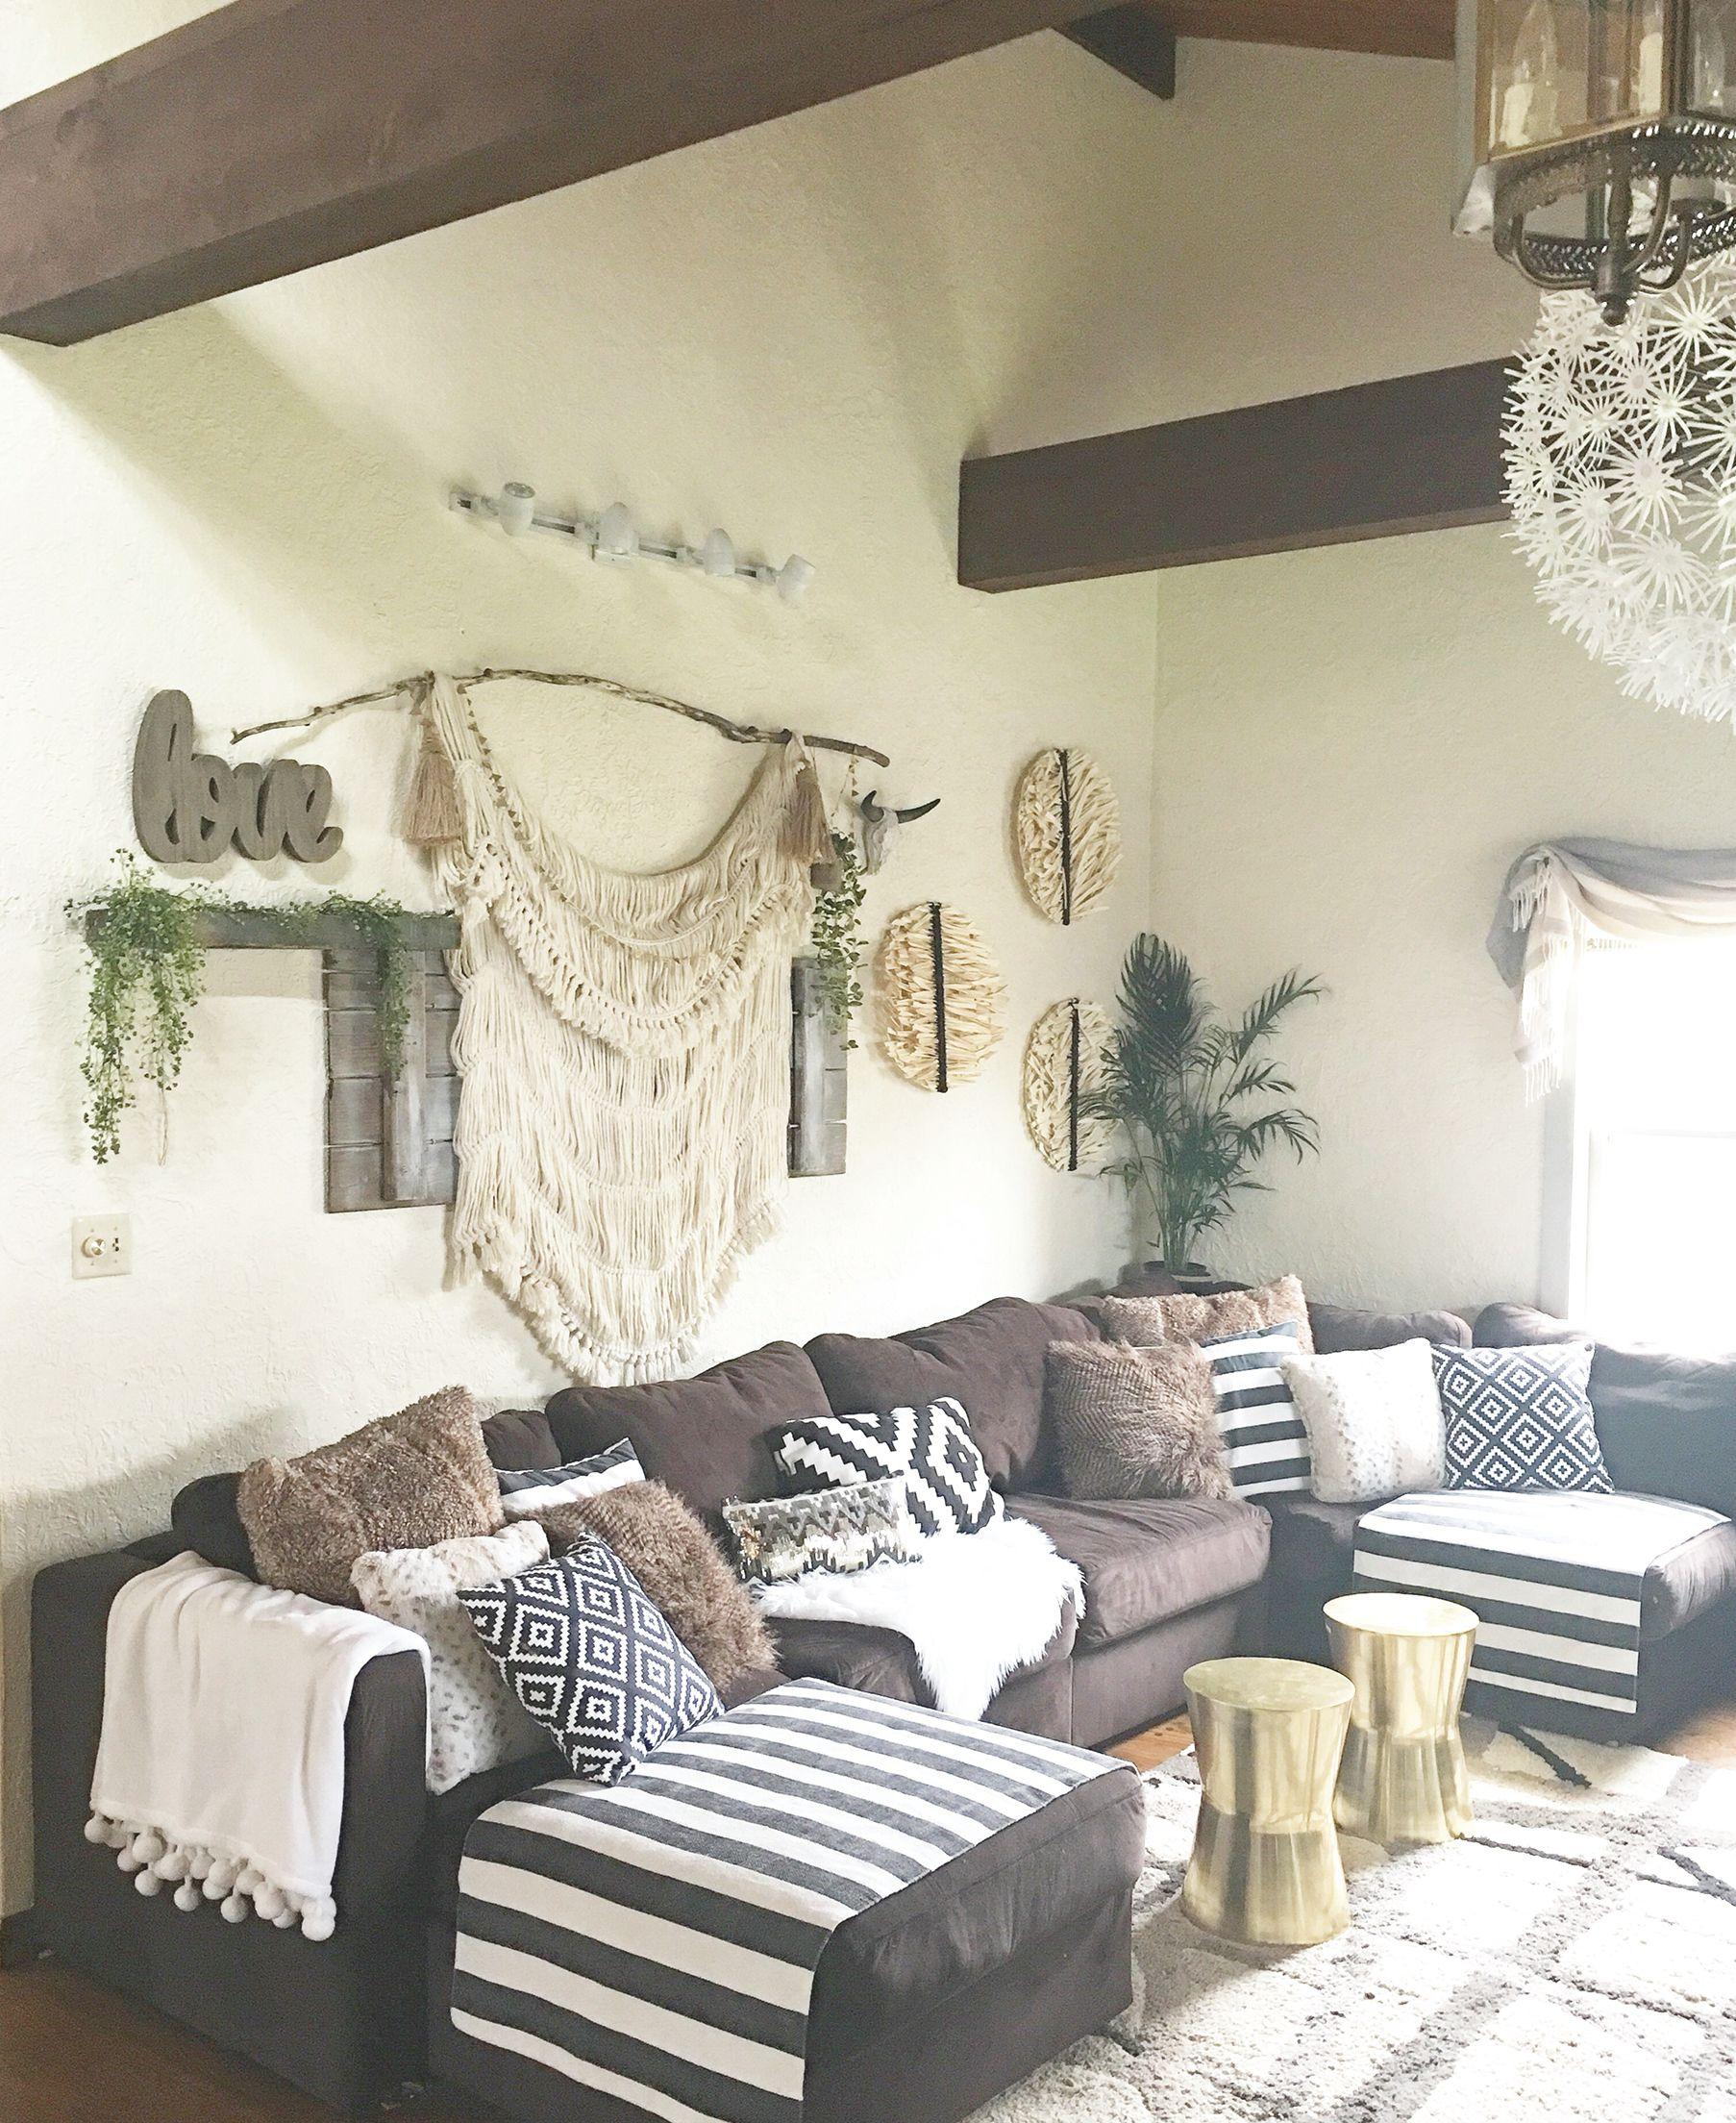 Decorating ideas for living room walls boho rustic glam living room  household amenities  pinterest